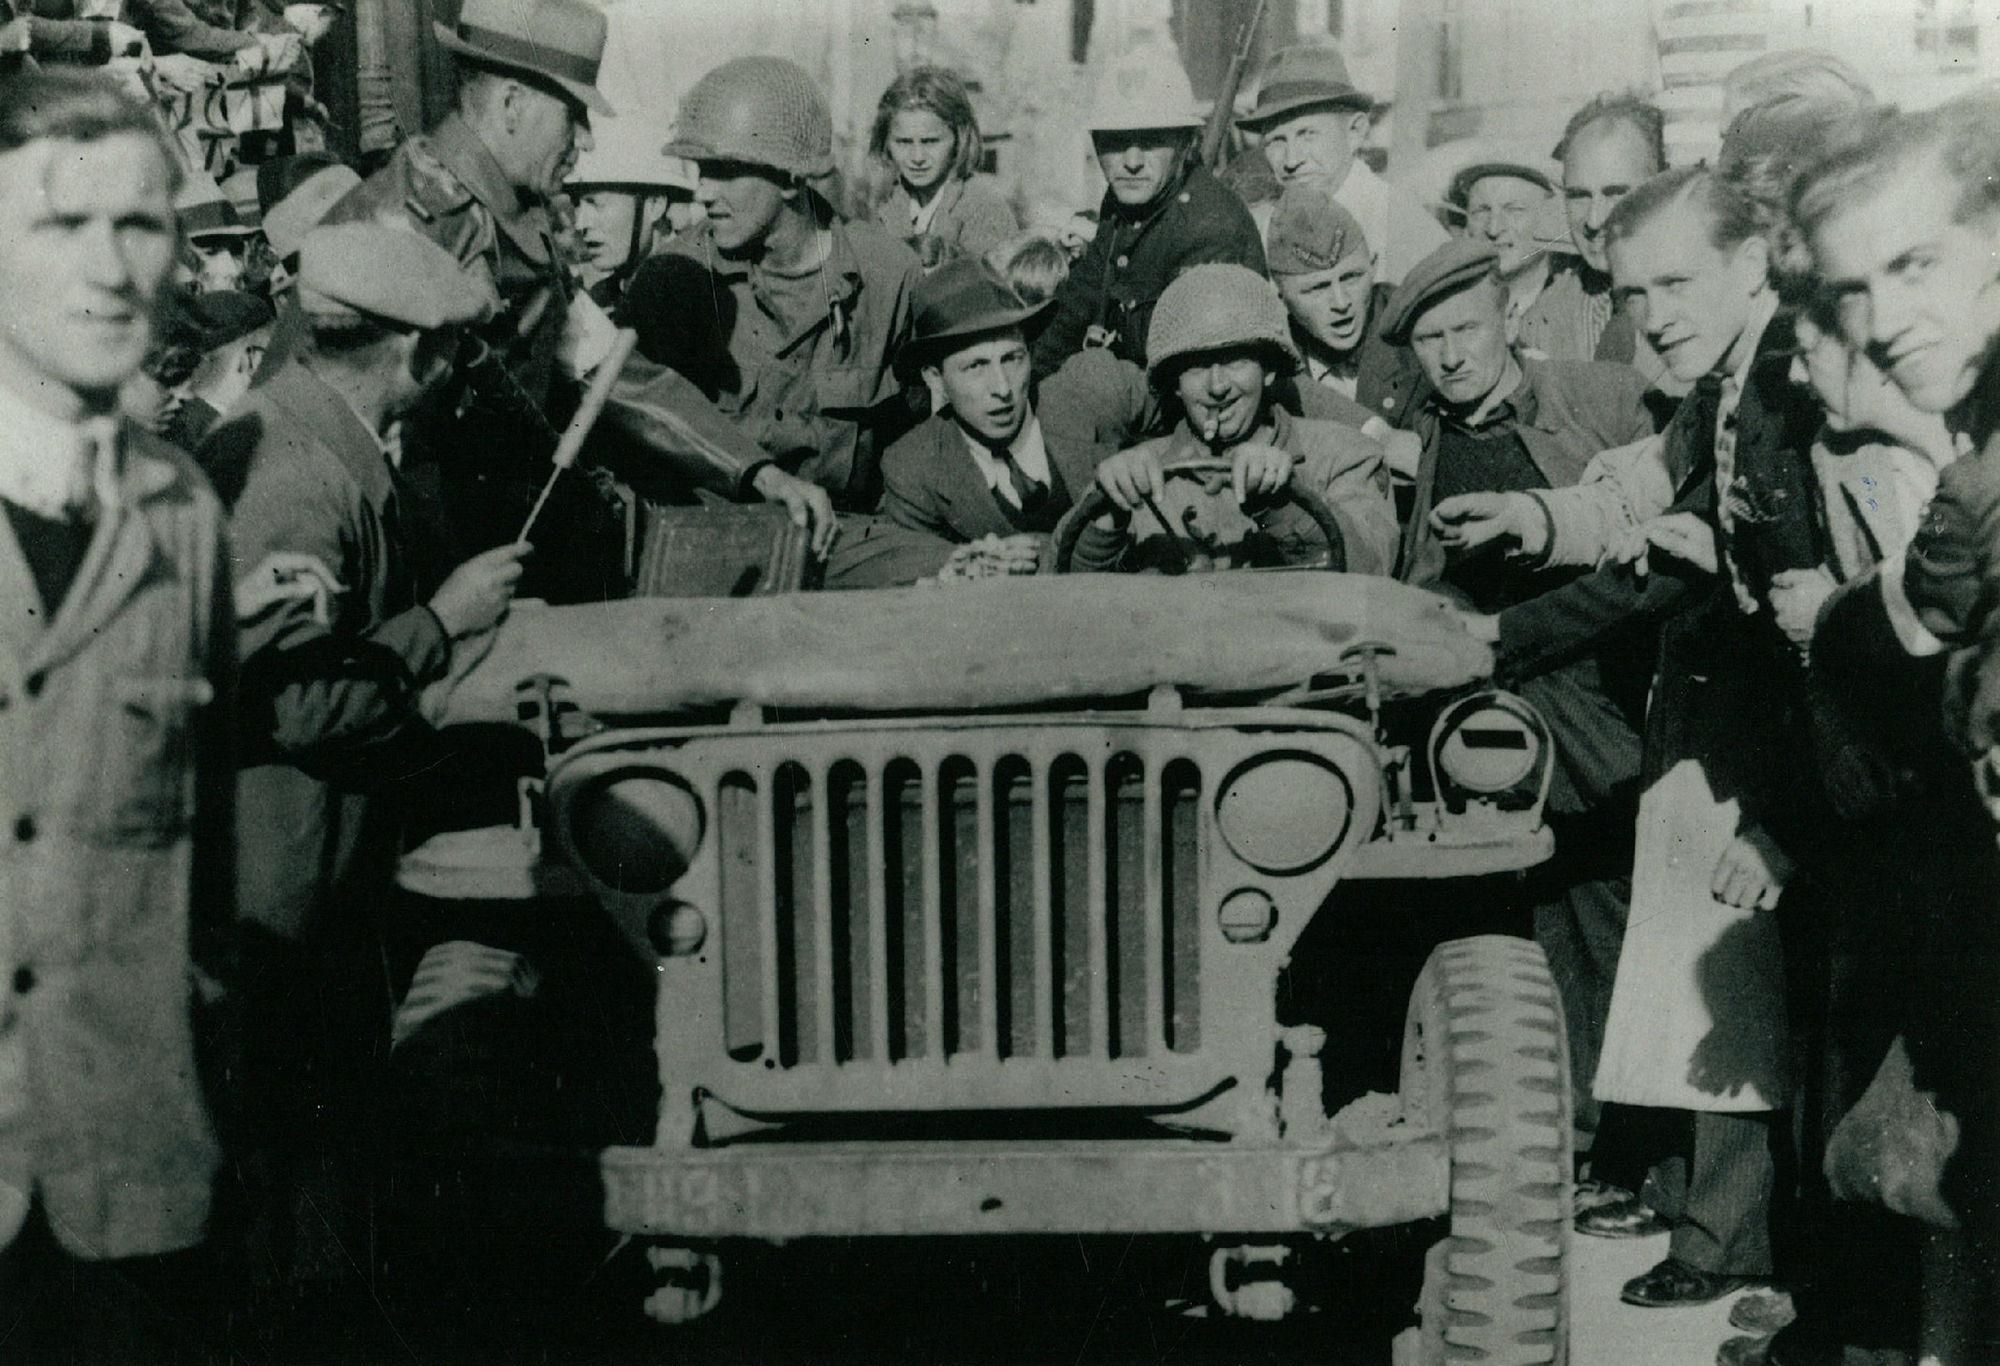 Bevrijding 4 september 1944